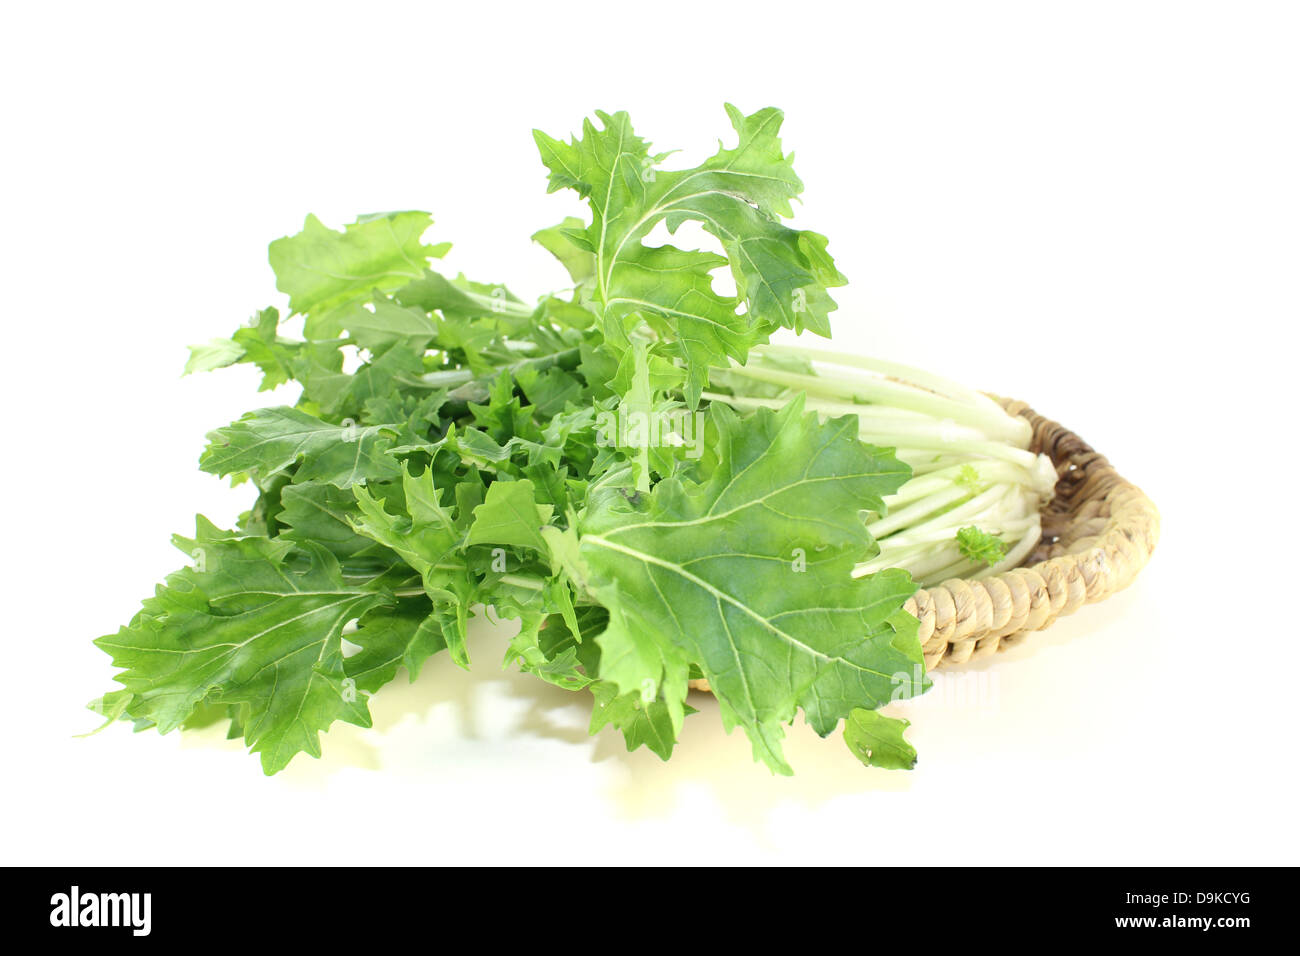 fresh Turnip green leafs on a light background Stock Photo